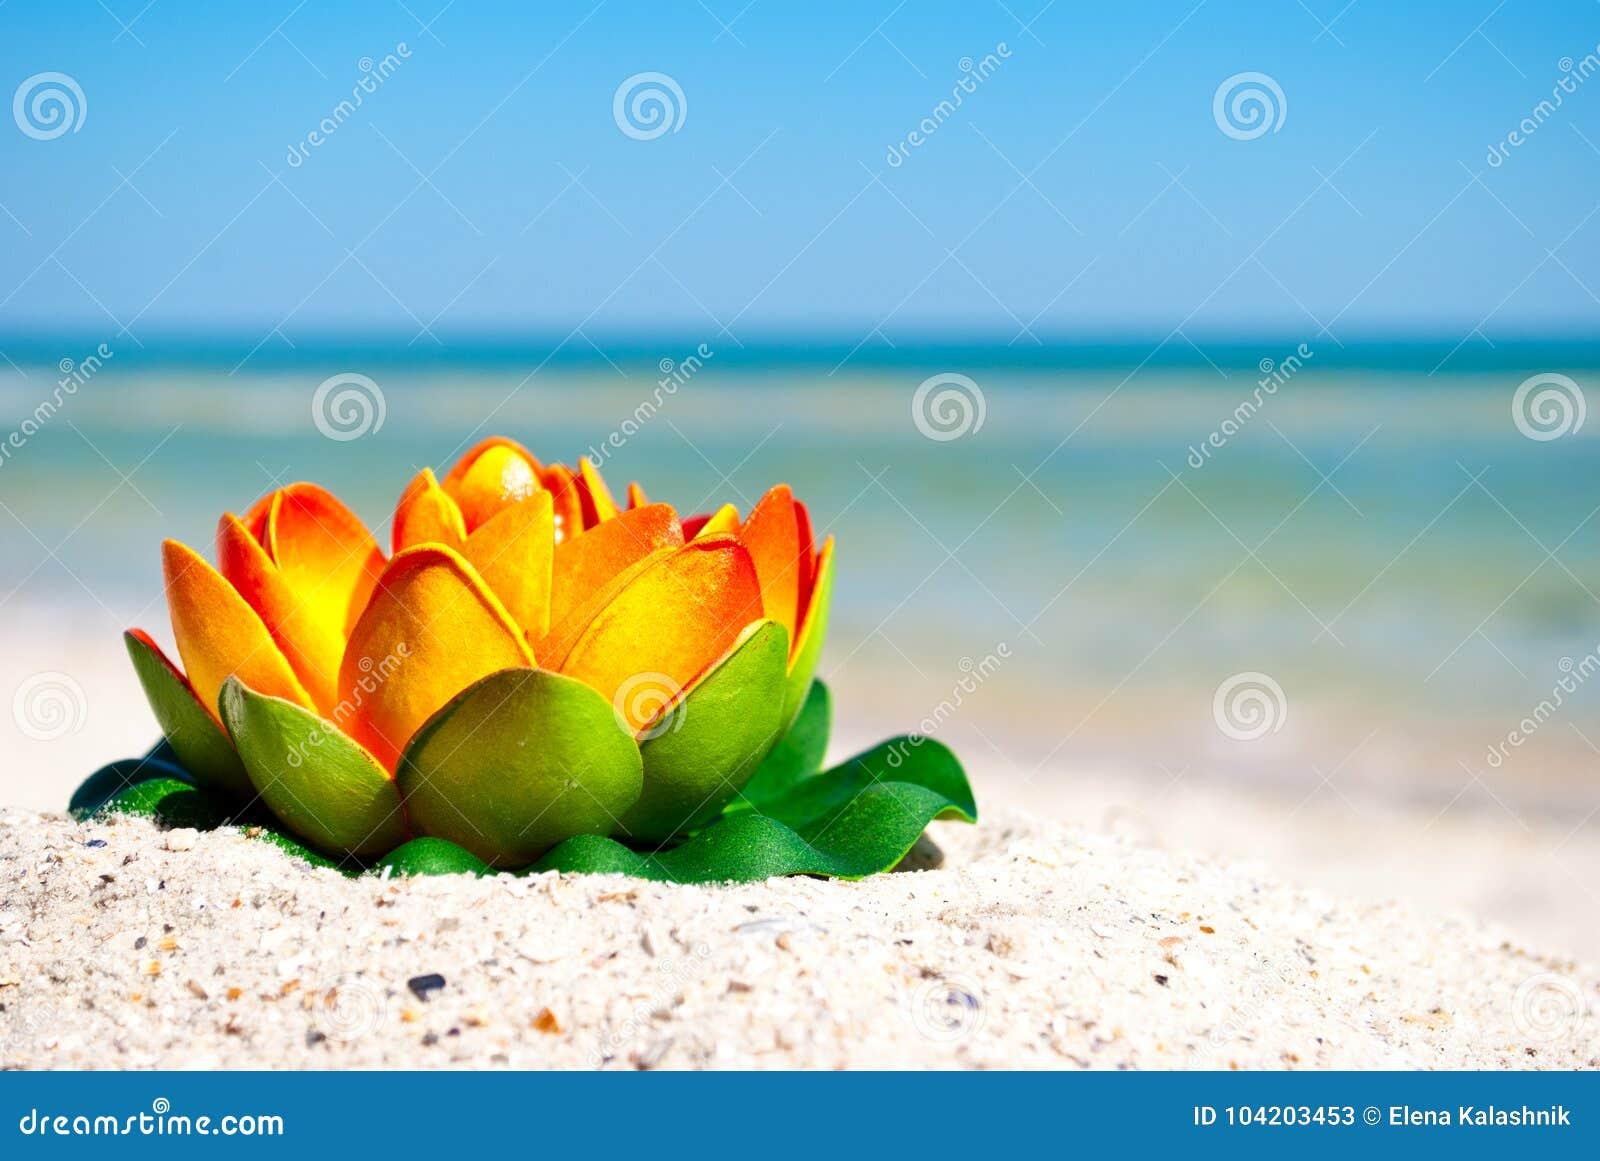 Orange lotus flower with green leaves lies on the sand on a orange lotus flower with green leaves lies on the sand on a background of blue sea izmirmasajfo